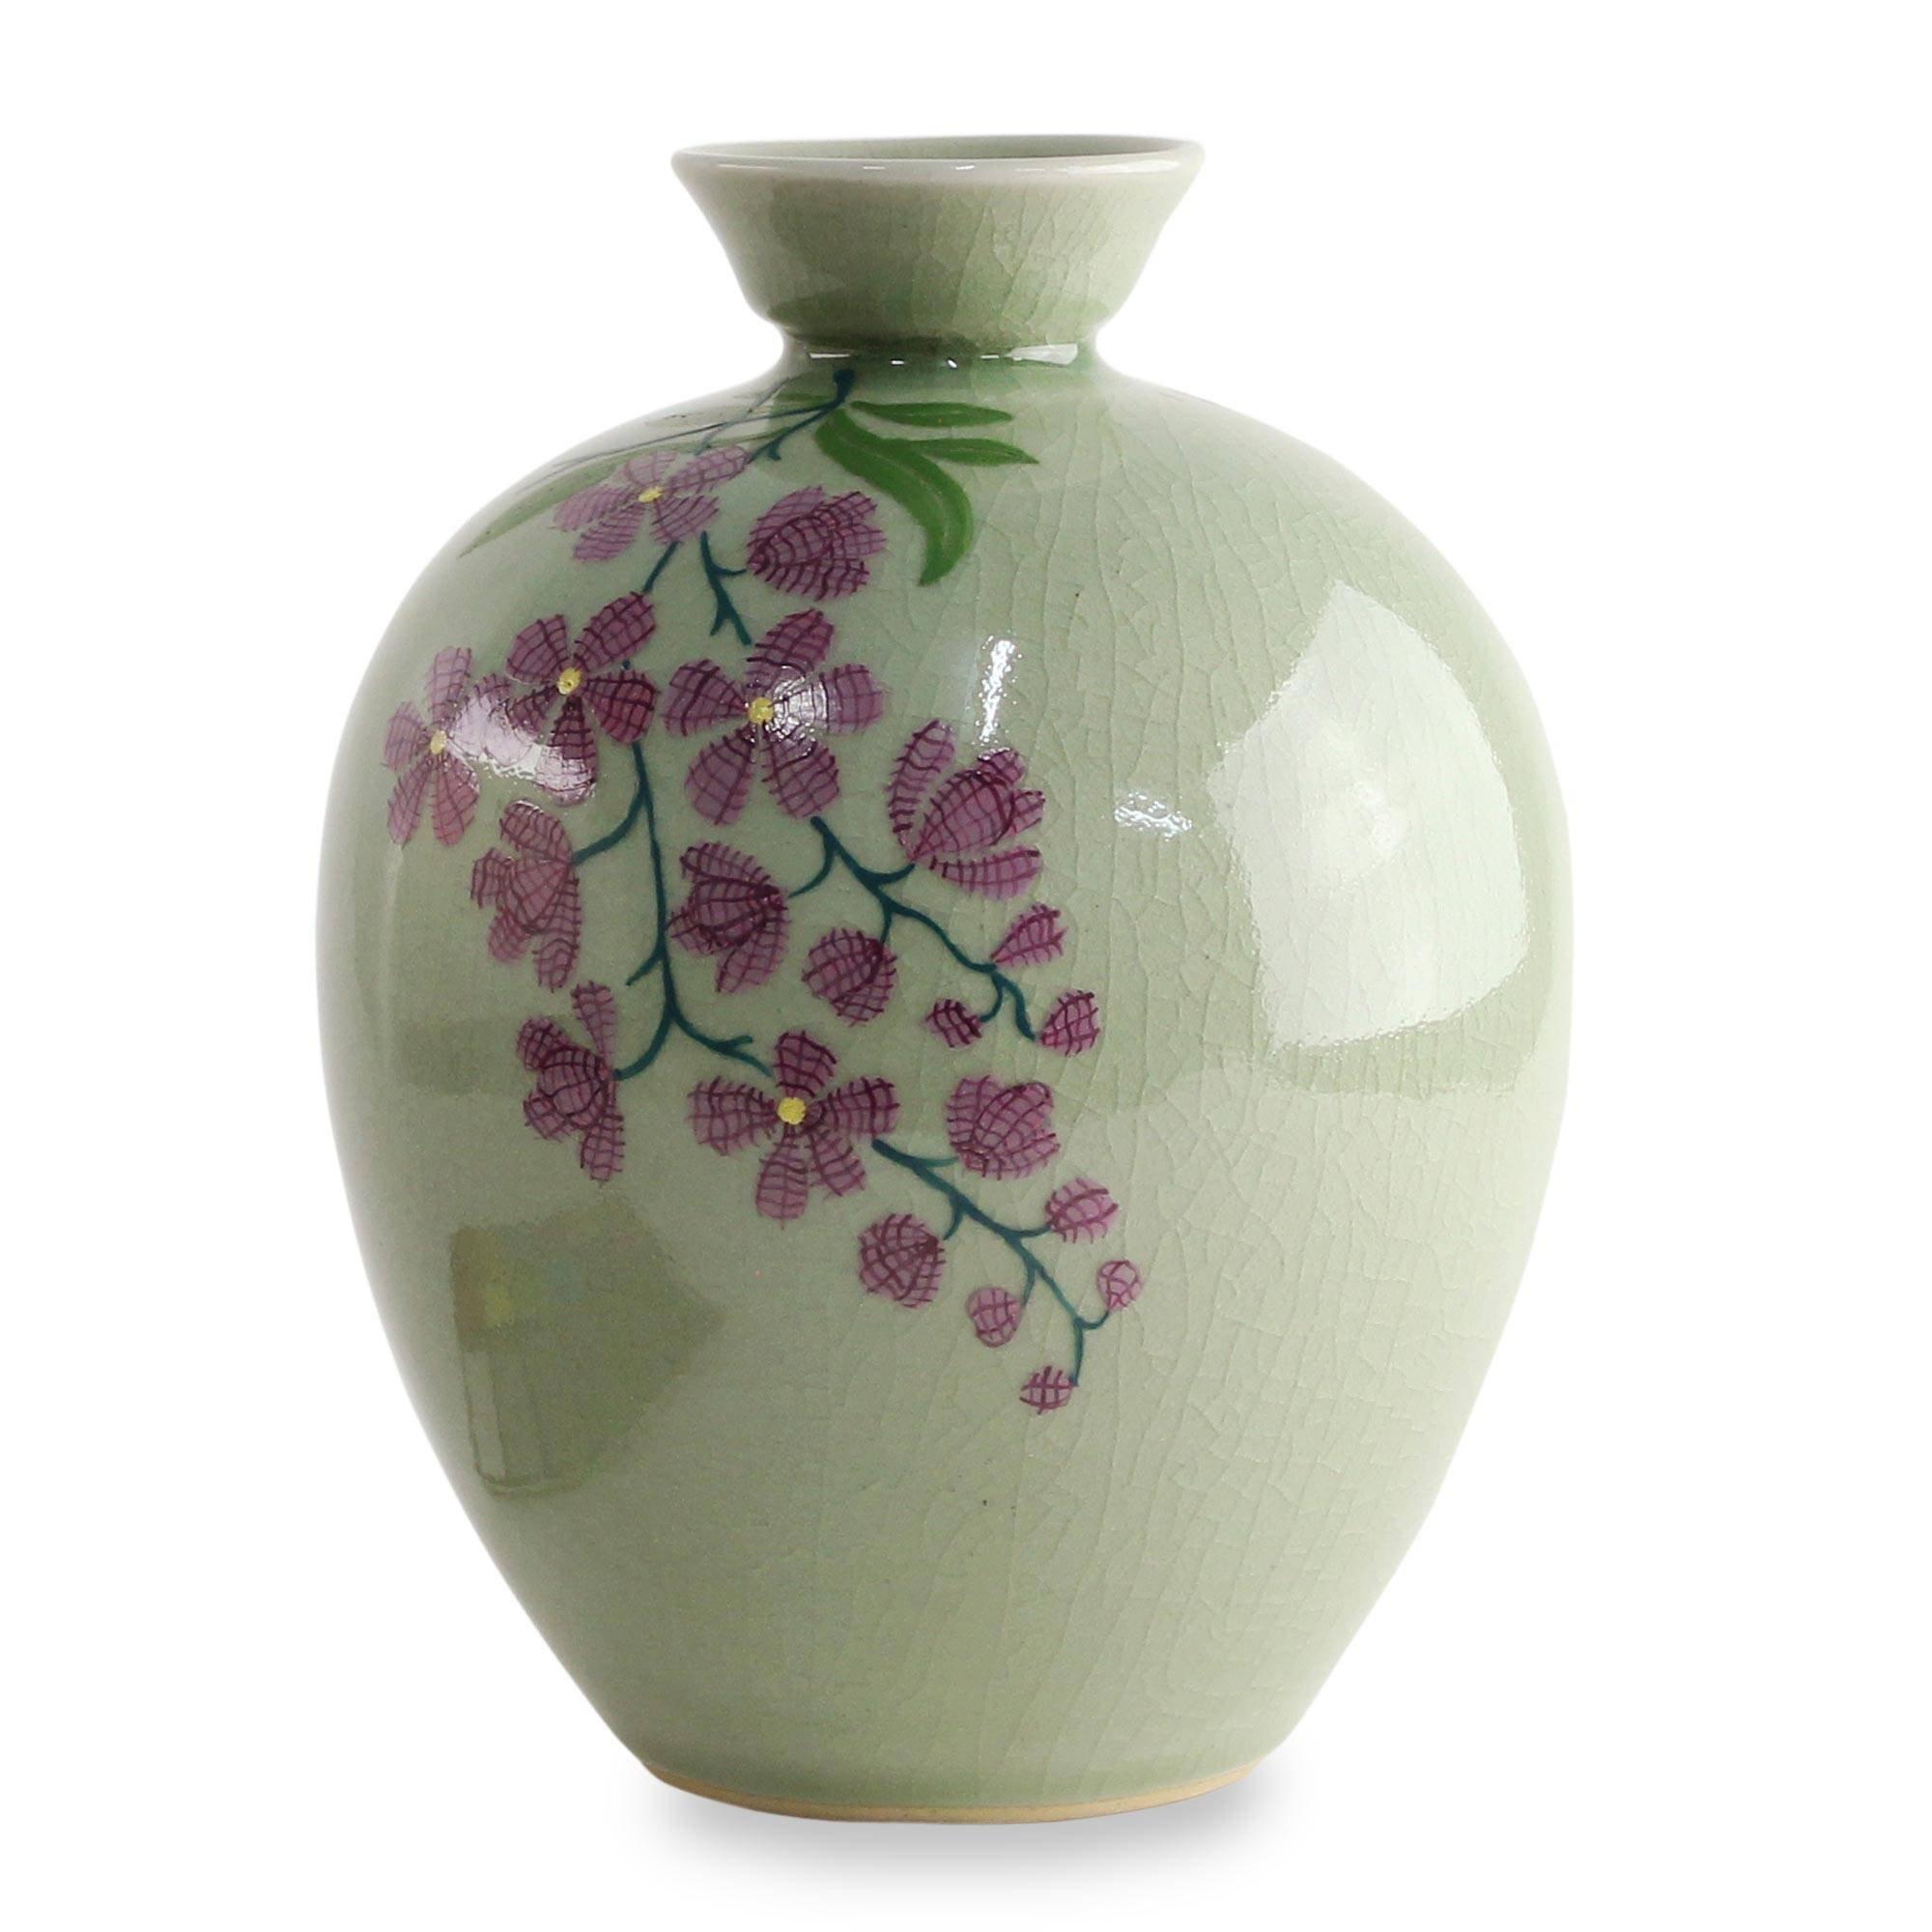 NOVICA Decorative Ceramic Celadon Vase, Green and Pink, 'Round Garden'